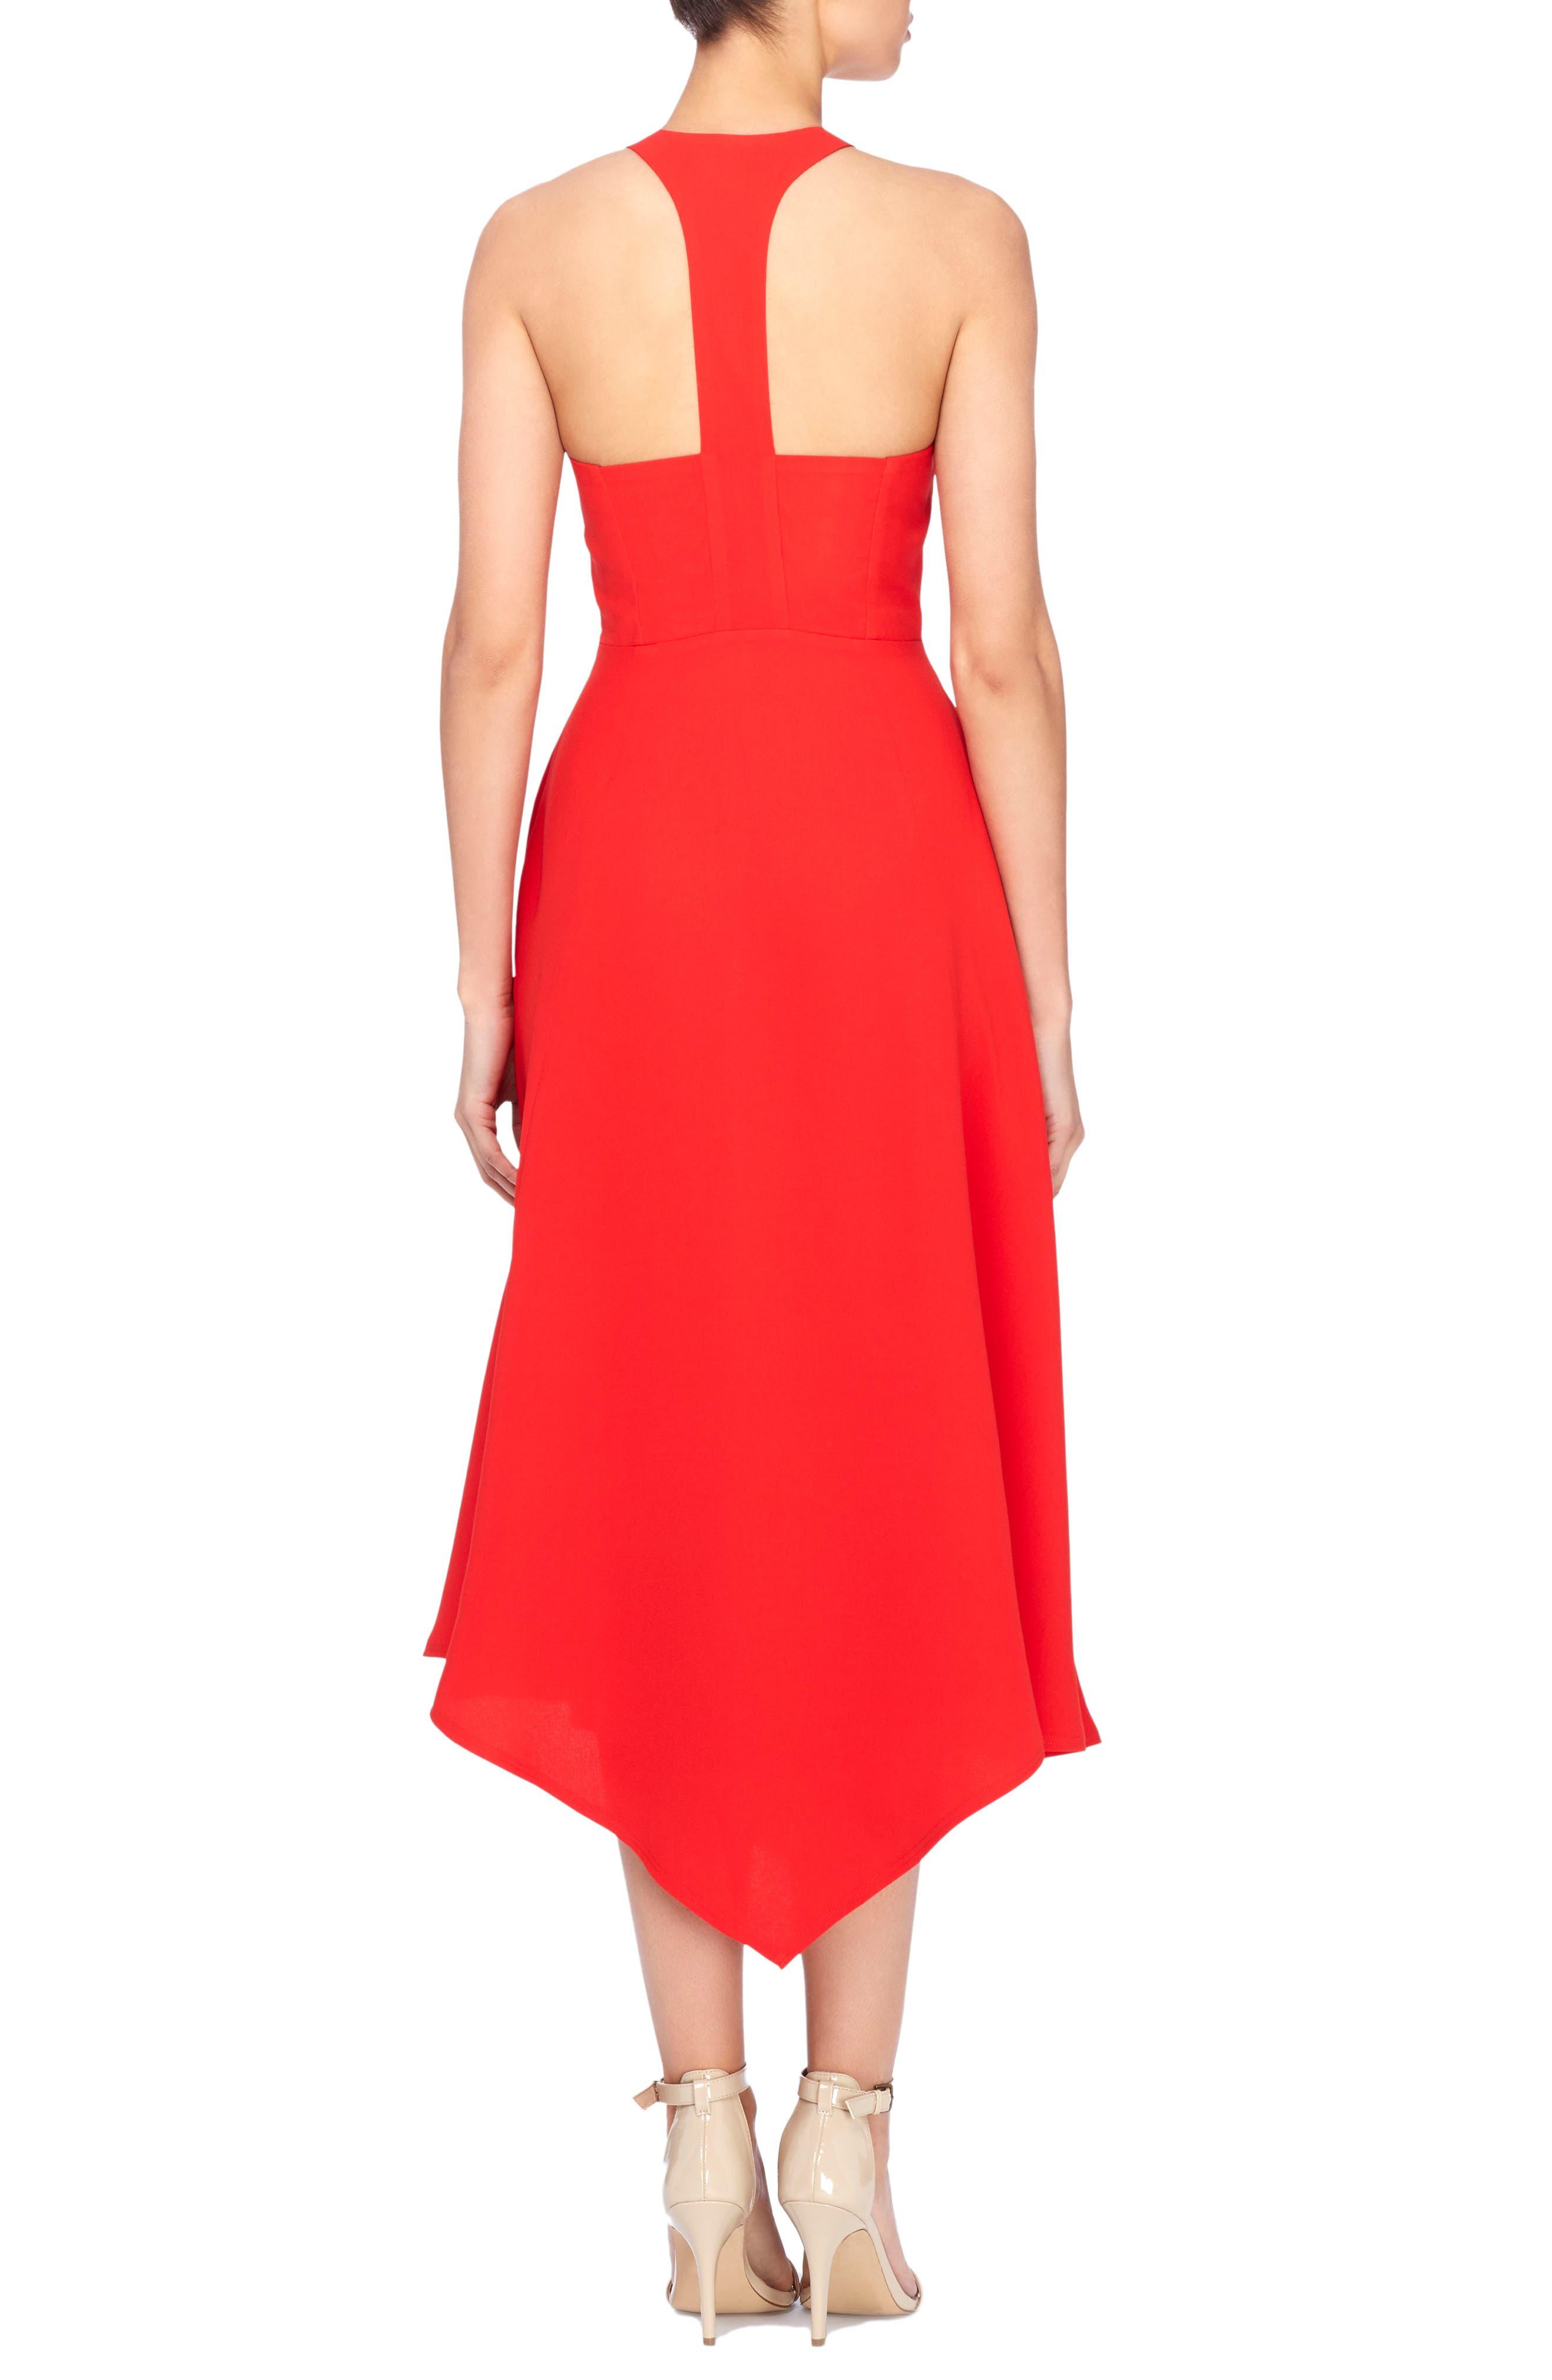 Reggie T-Back Fit & Flare Dress,                             Alternate thumbnail 2, color,                             Tomato Red